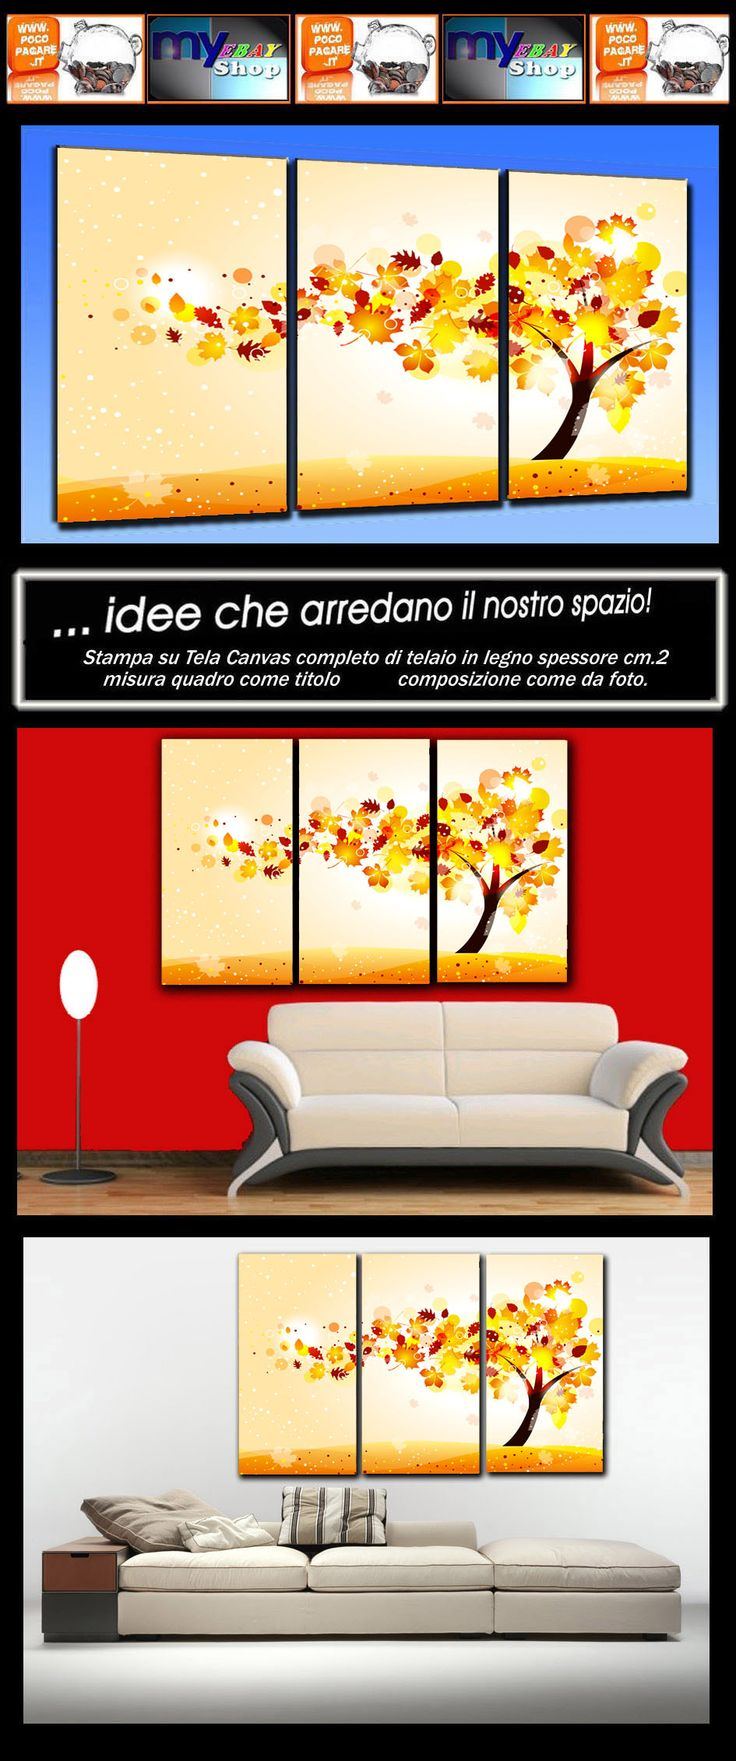 16 best idee per quadro soggiorno images on Pinterest | Canvases ...